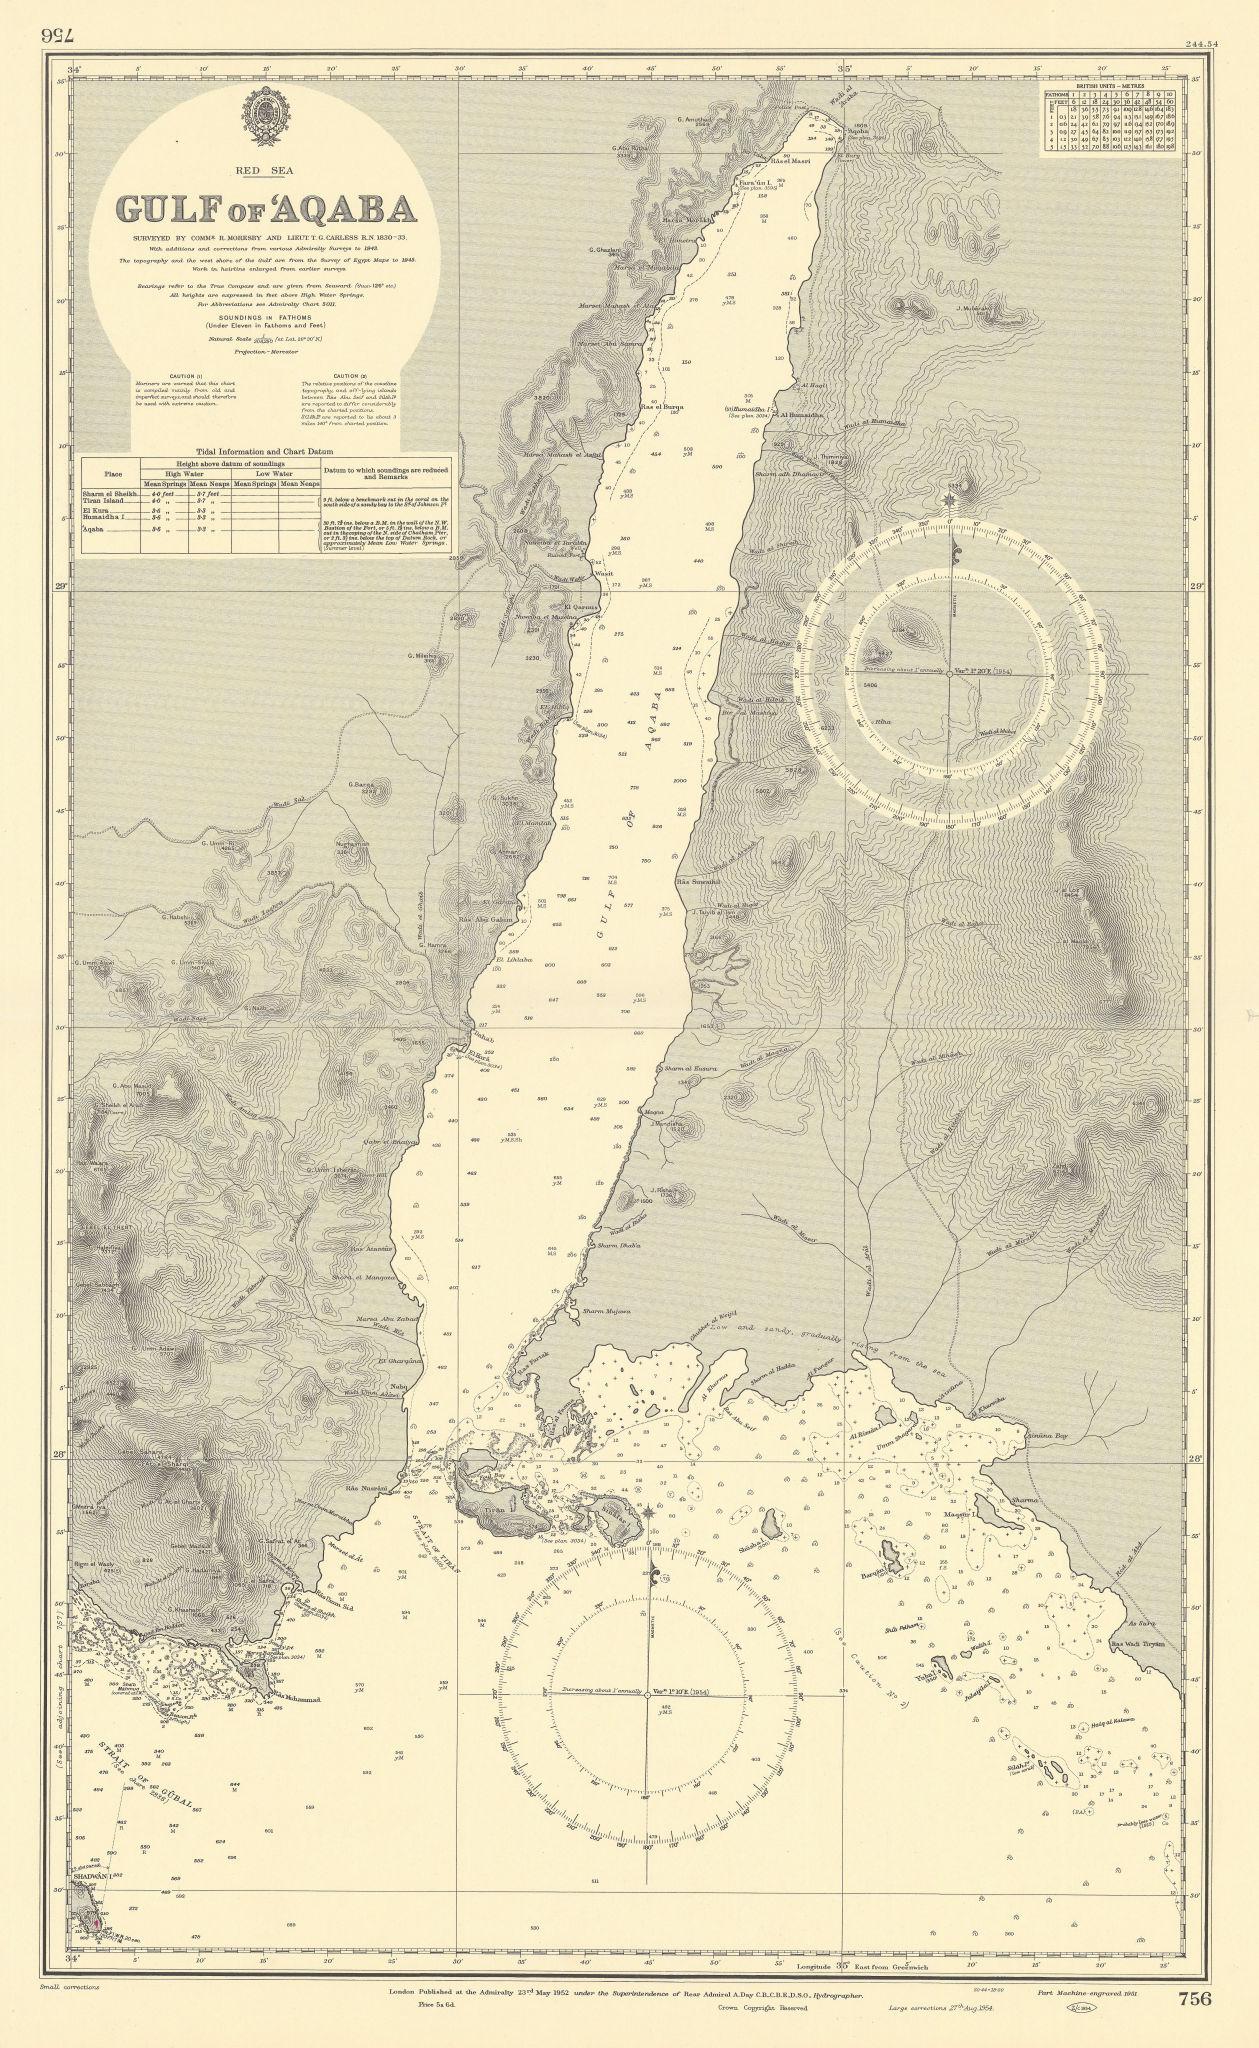 Gulf of Aqaba Red Sea Egypt Sharm el Sheikh. ADMIRALTY sea chart 1952 (1954) map